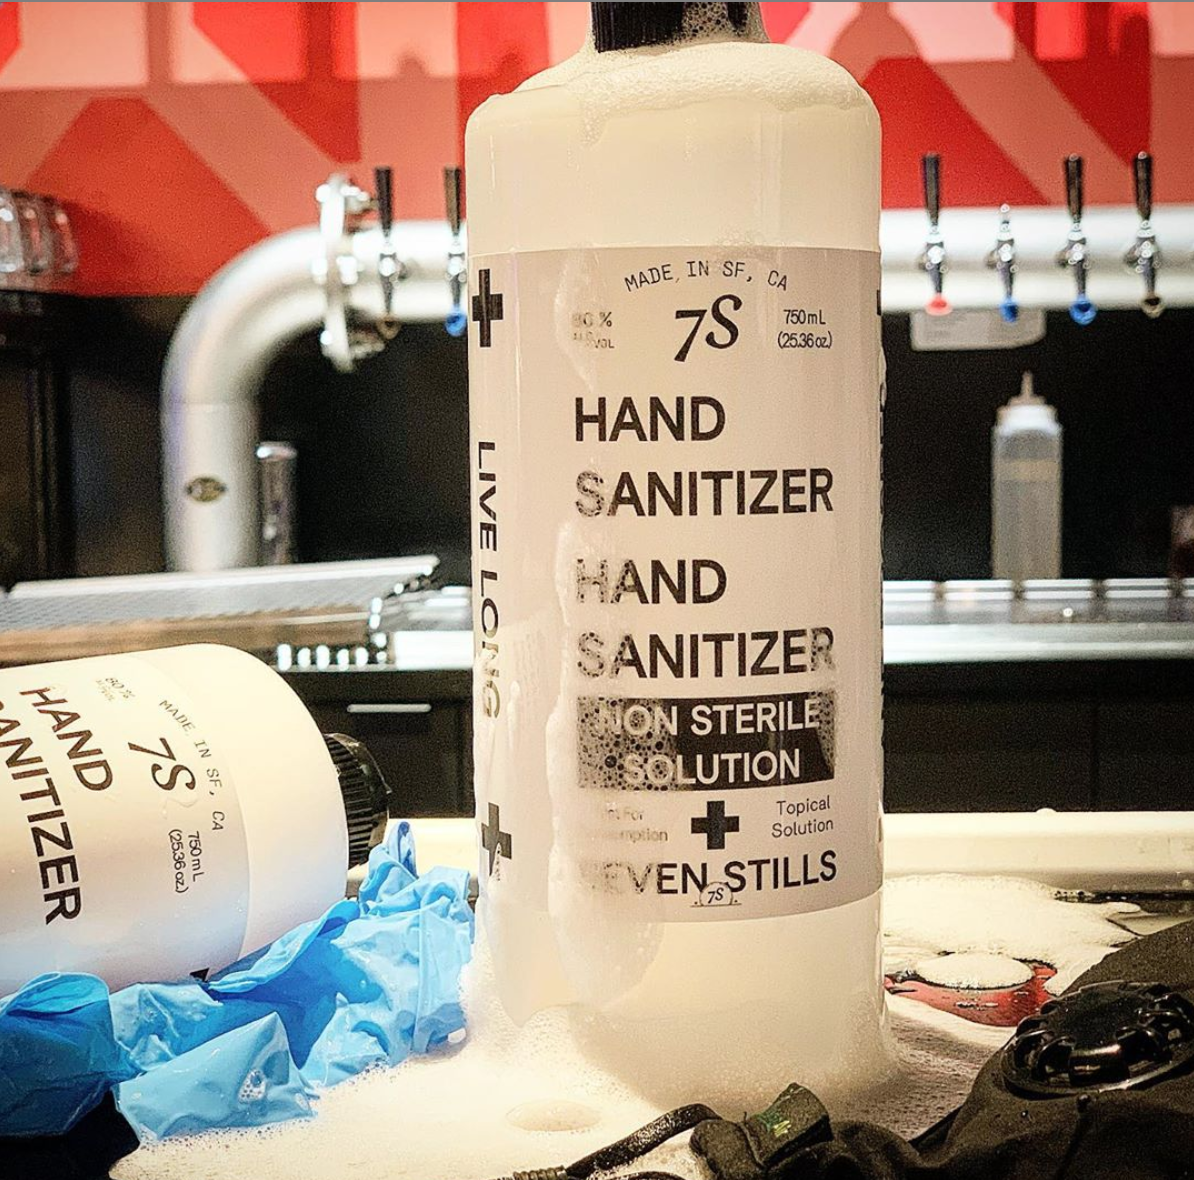 Hand sanitizer at Seven Stills